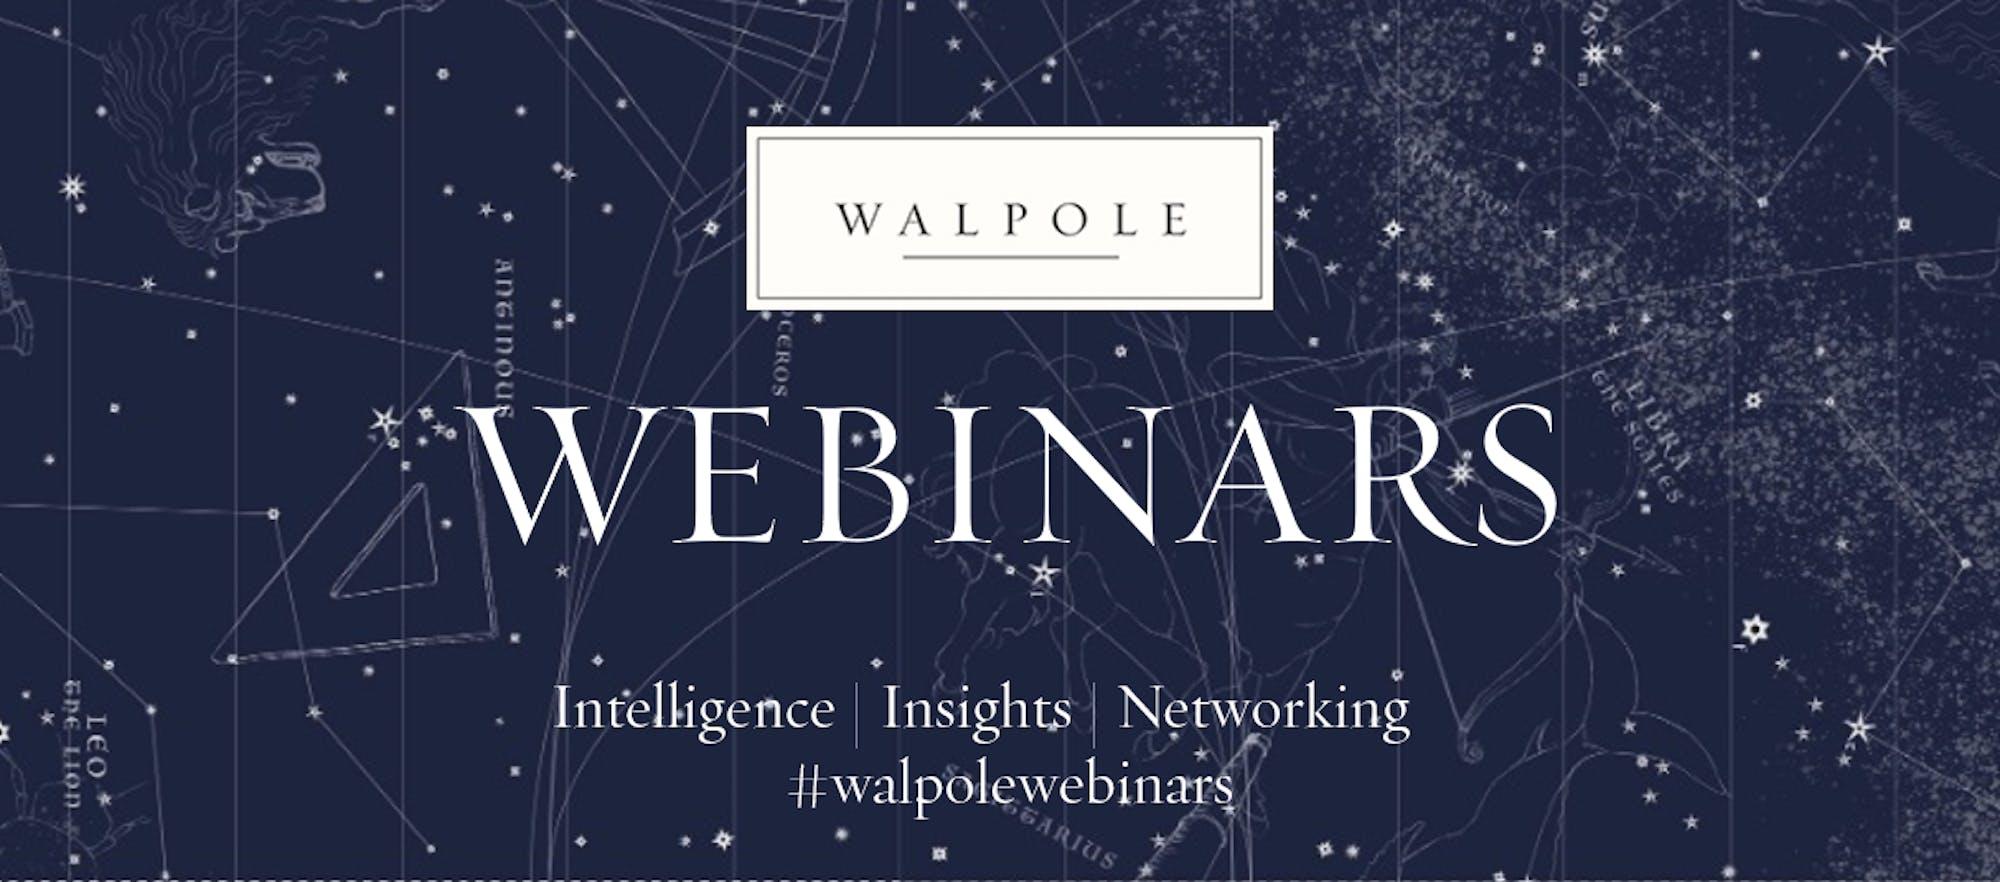 Introducing Walpole Webinars  Join the Walpole Community Online